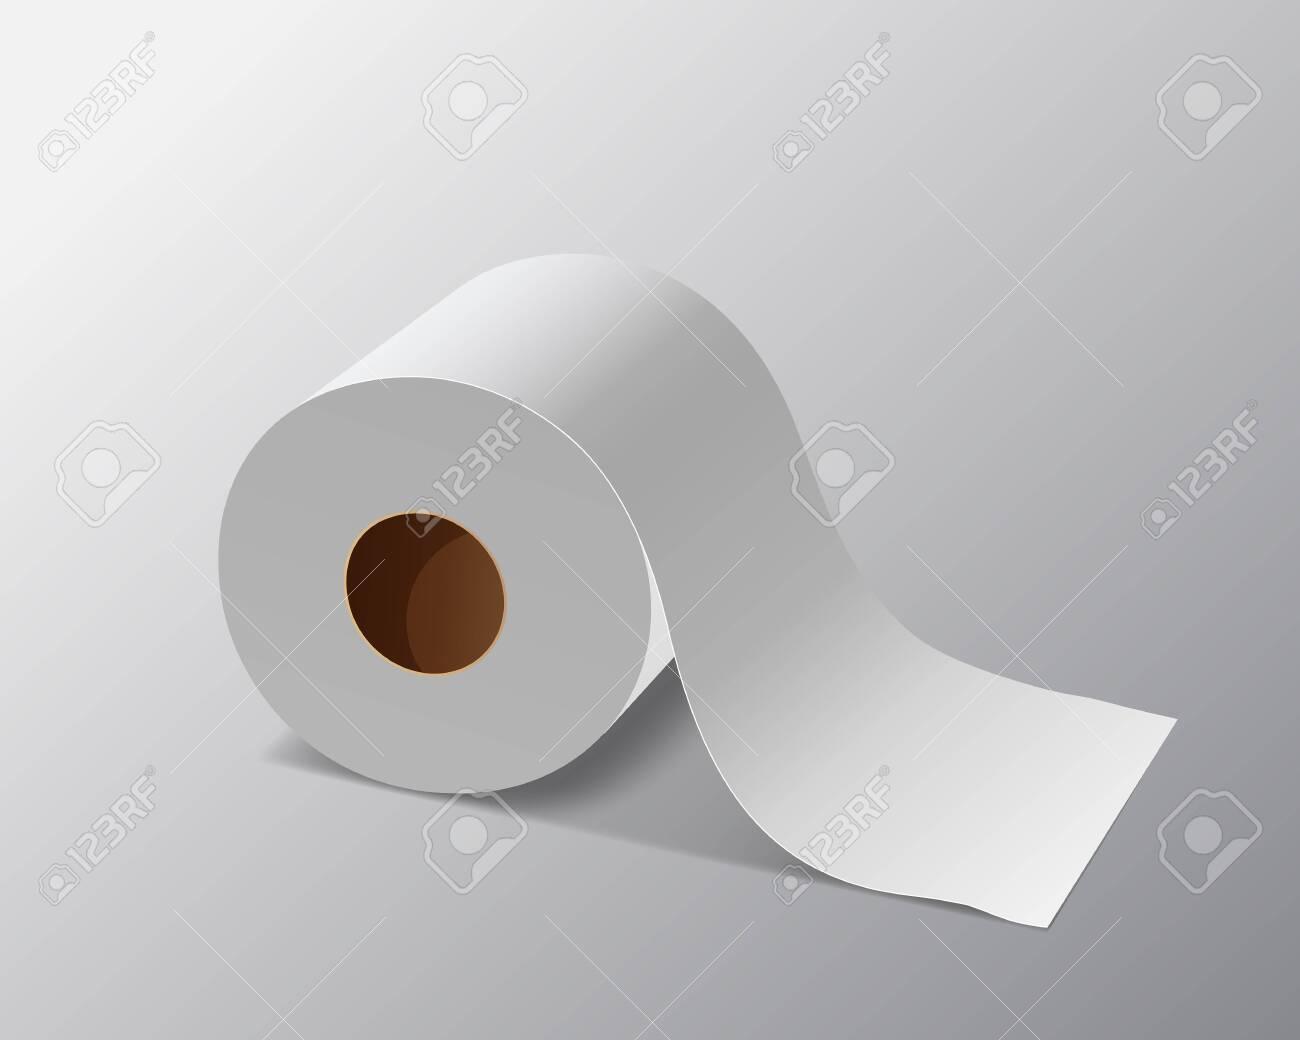 Vector Tissue paper roll, design on gray background, illustration - 147640527